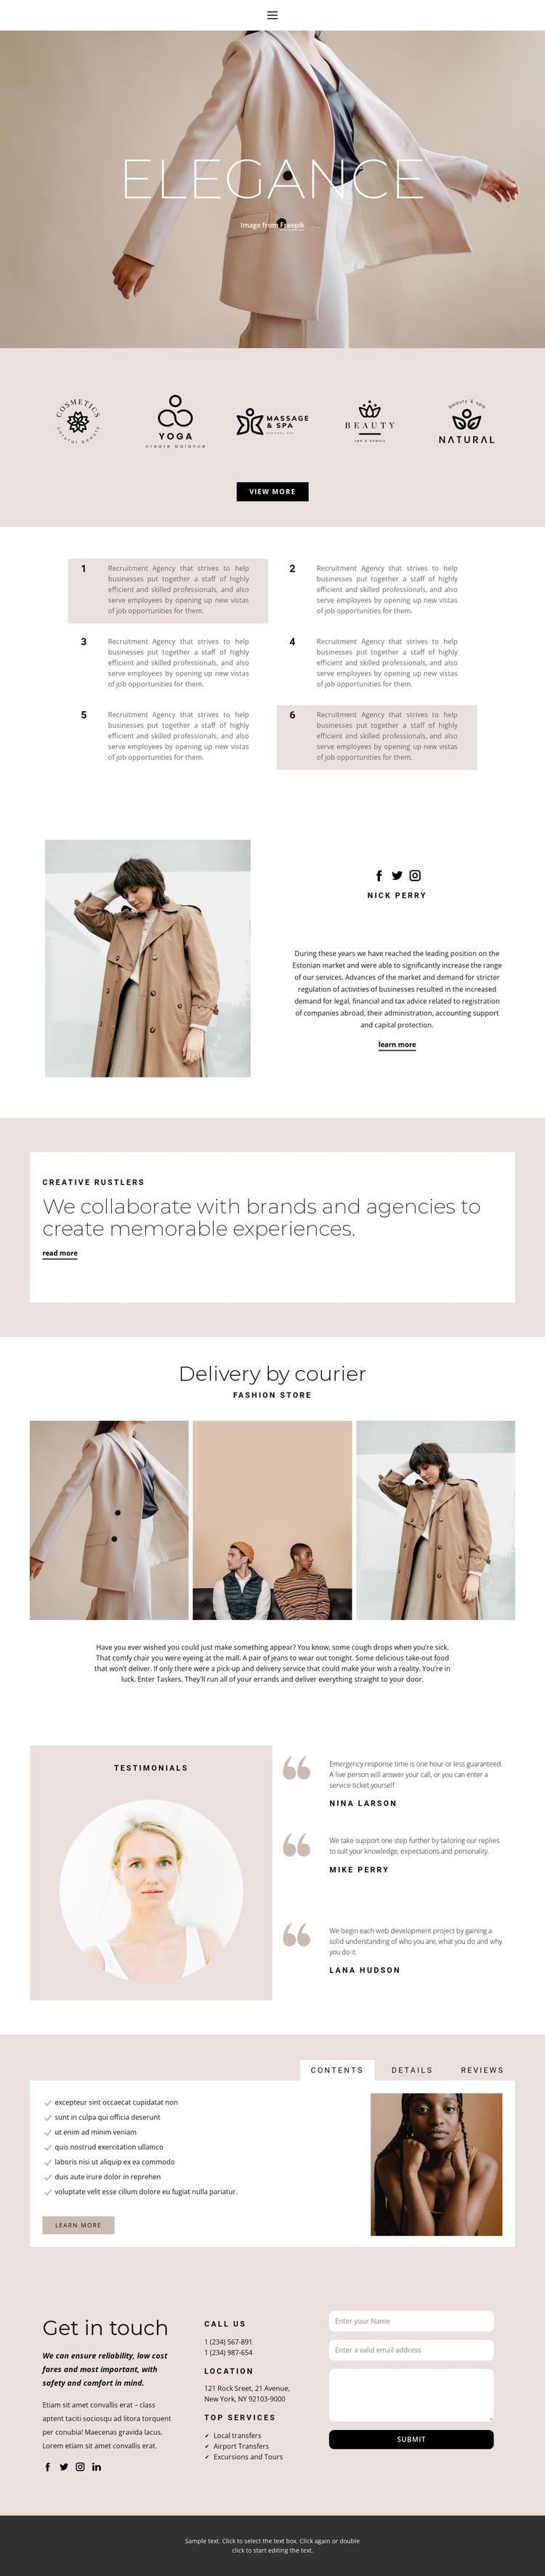 Elegance in fashion Web Page Designer